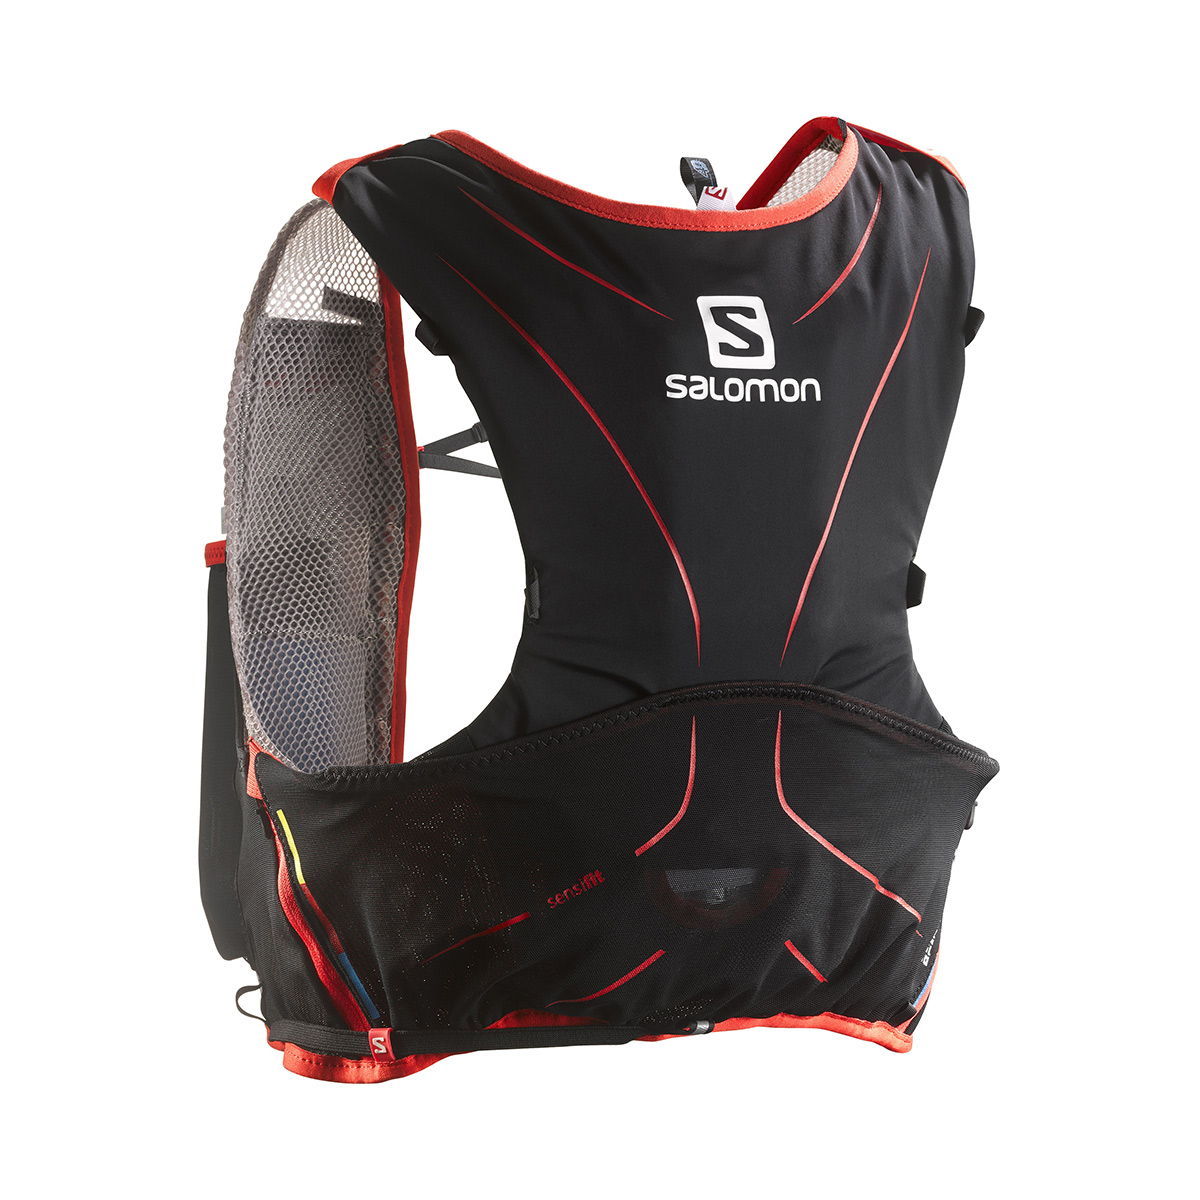 dcc5ca409000 Salomon S-Lab Advanced Skin 12Set Trail Running Pack